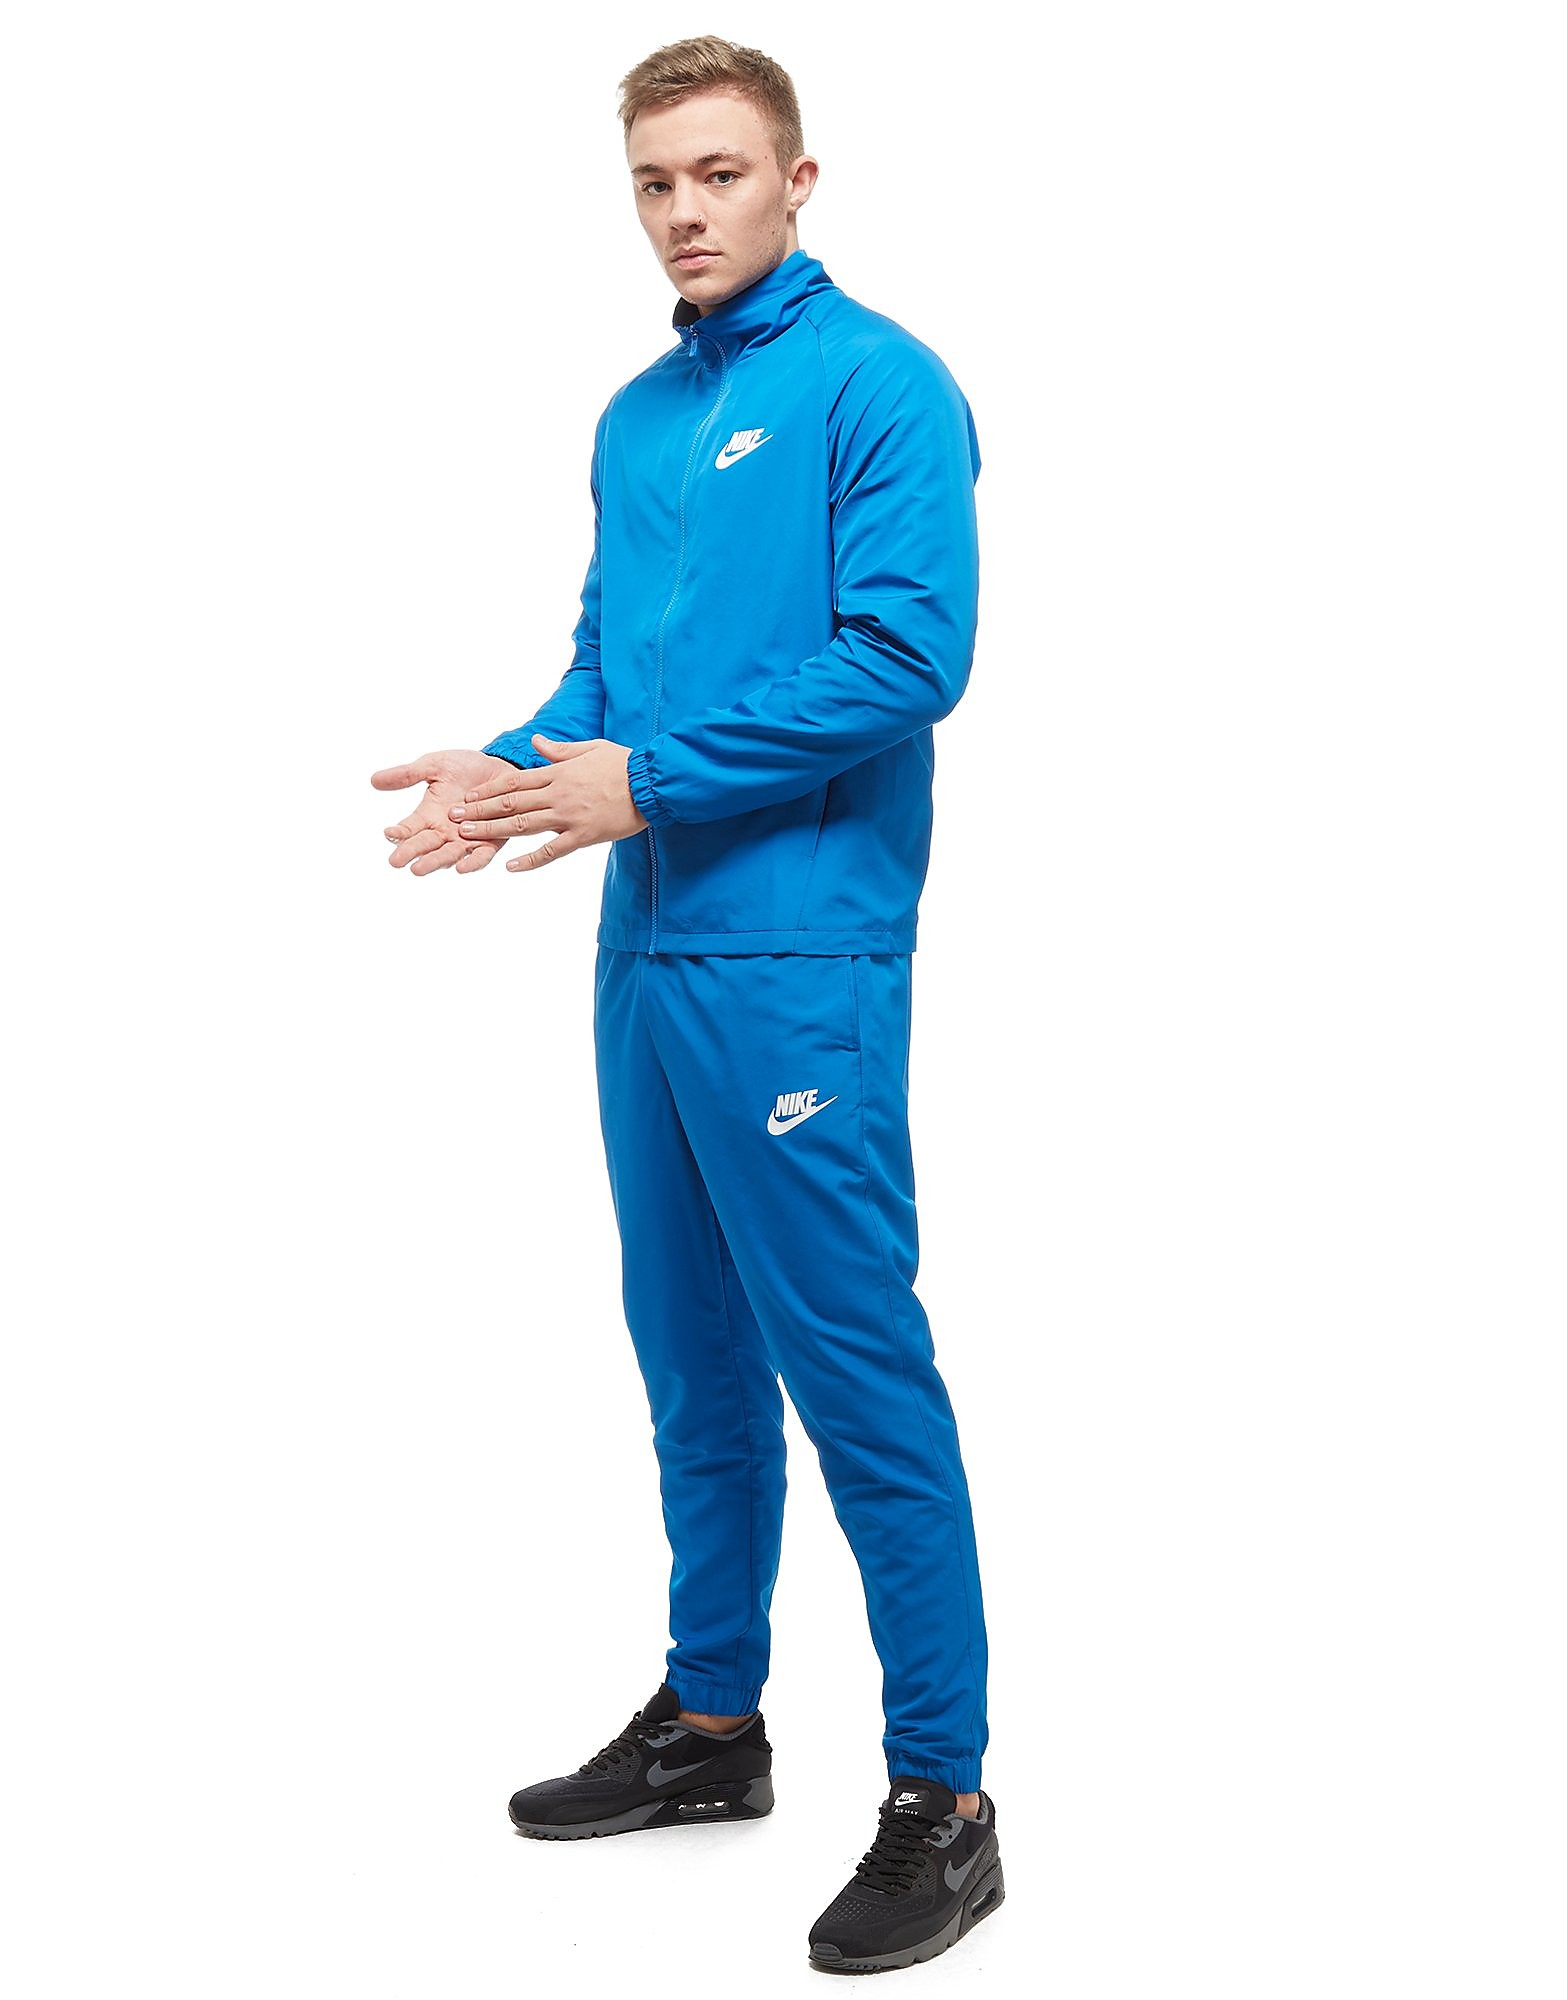 Nike Survêtement Season 2 Homme